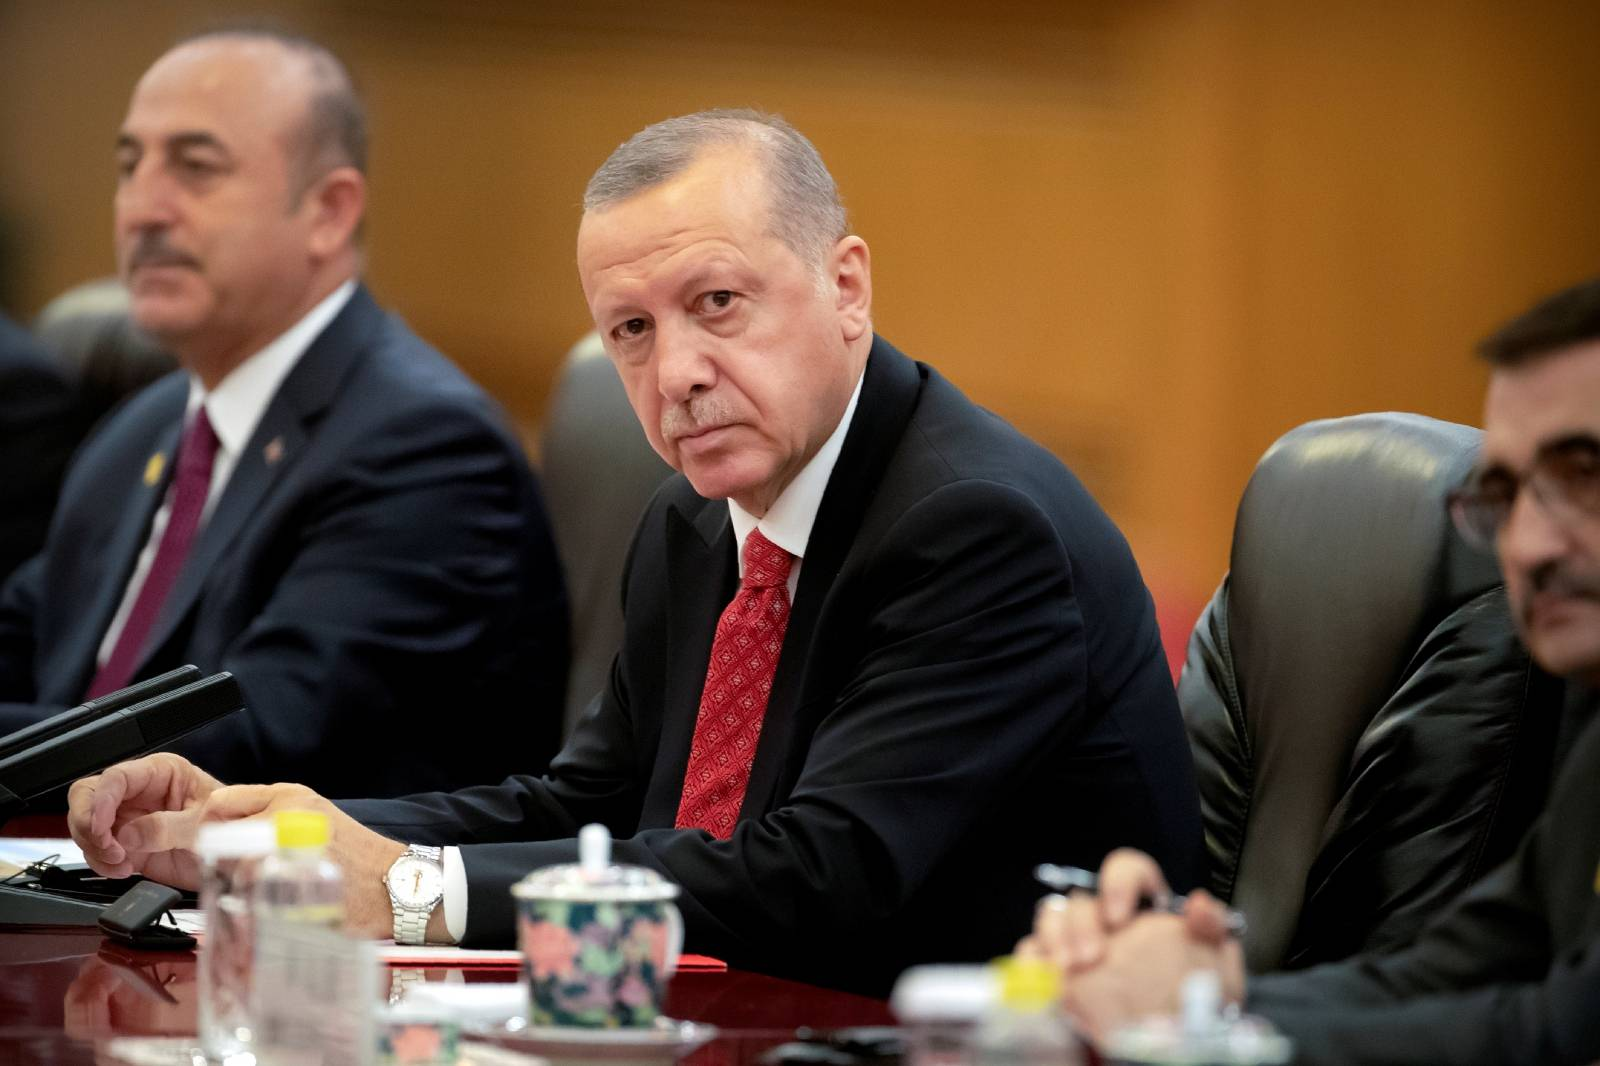 China's President Xi Jinping meets with Turkish President Recep Tayyip Erdogan in Beijing